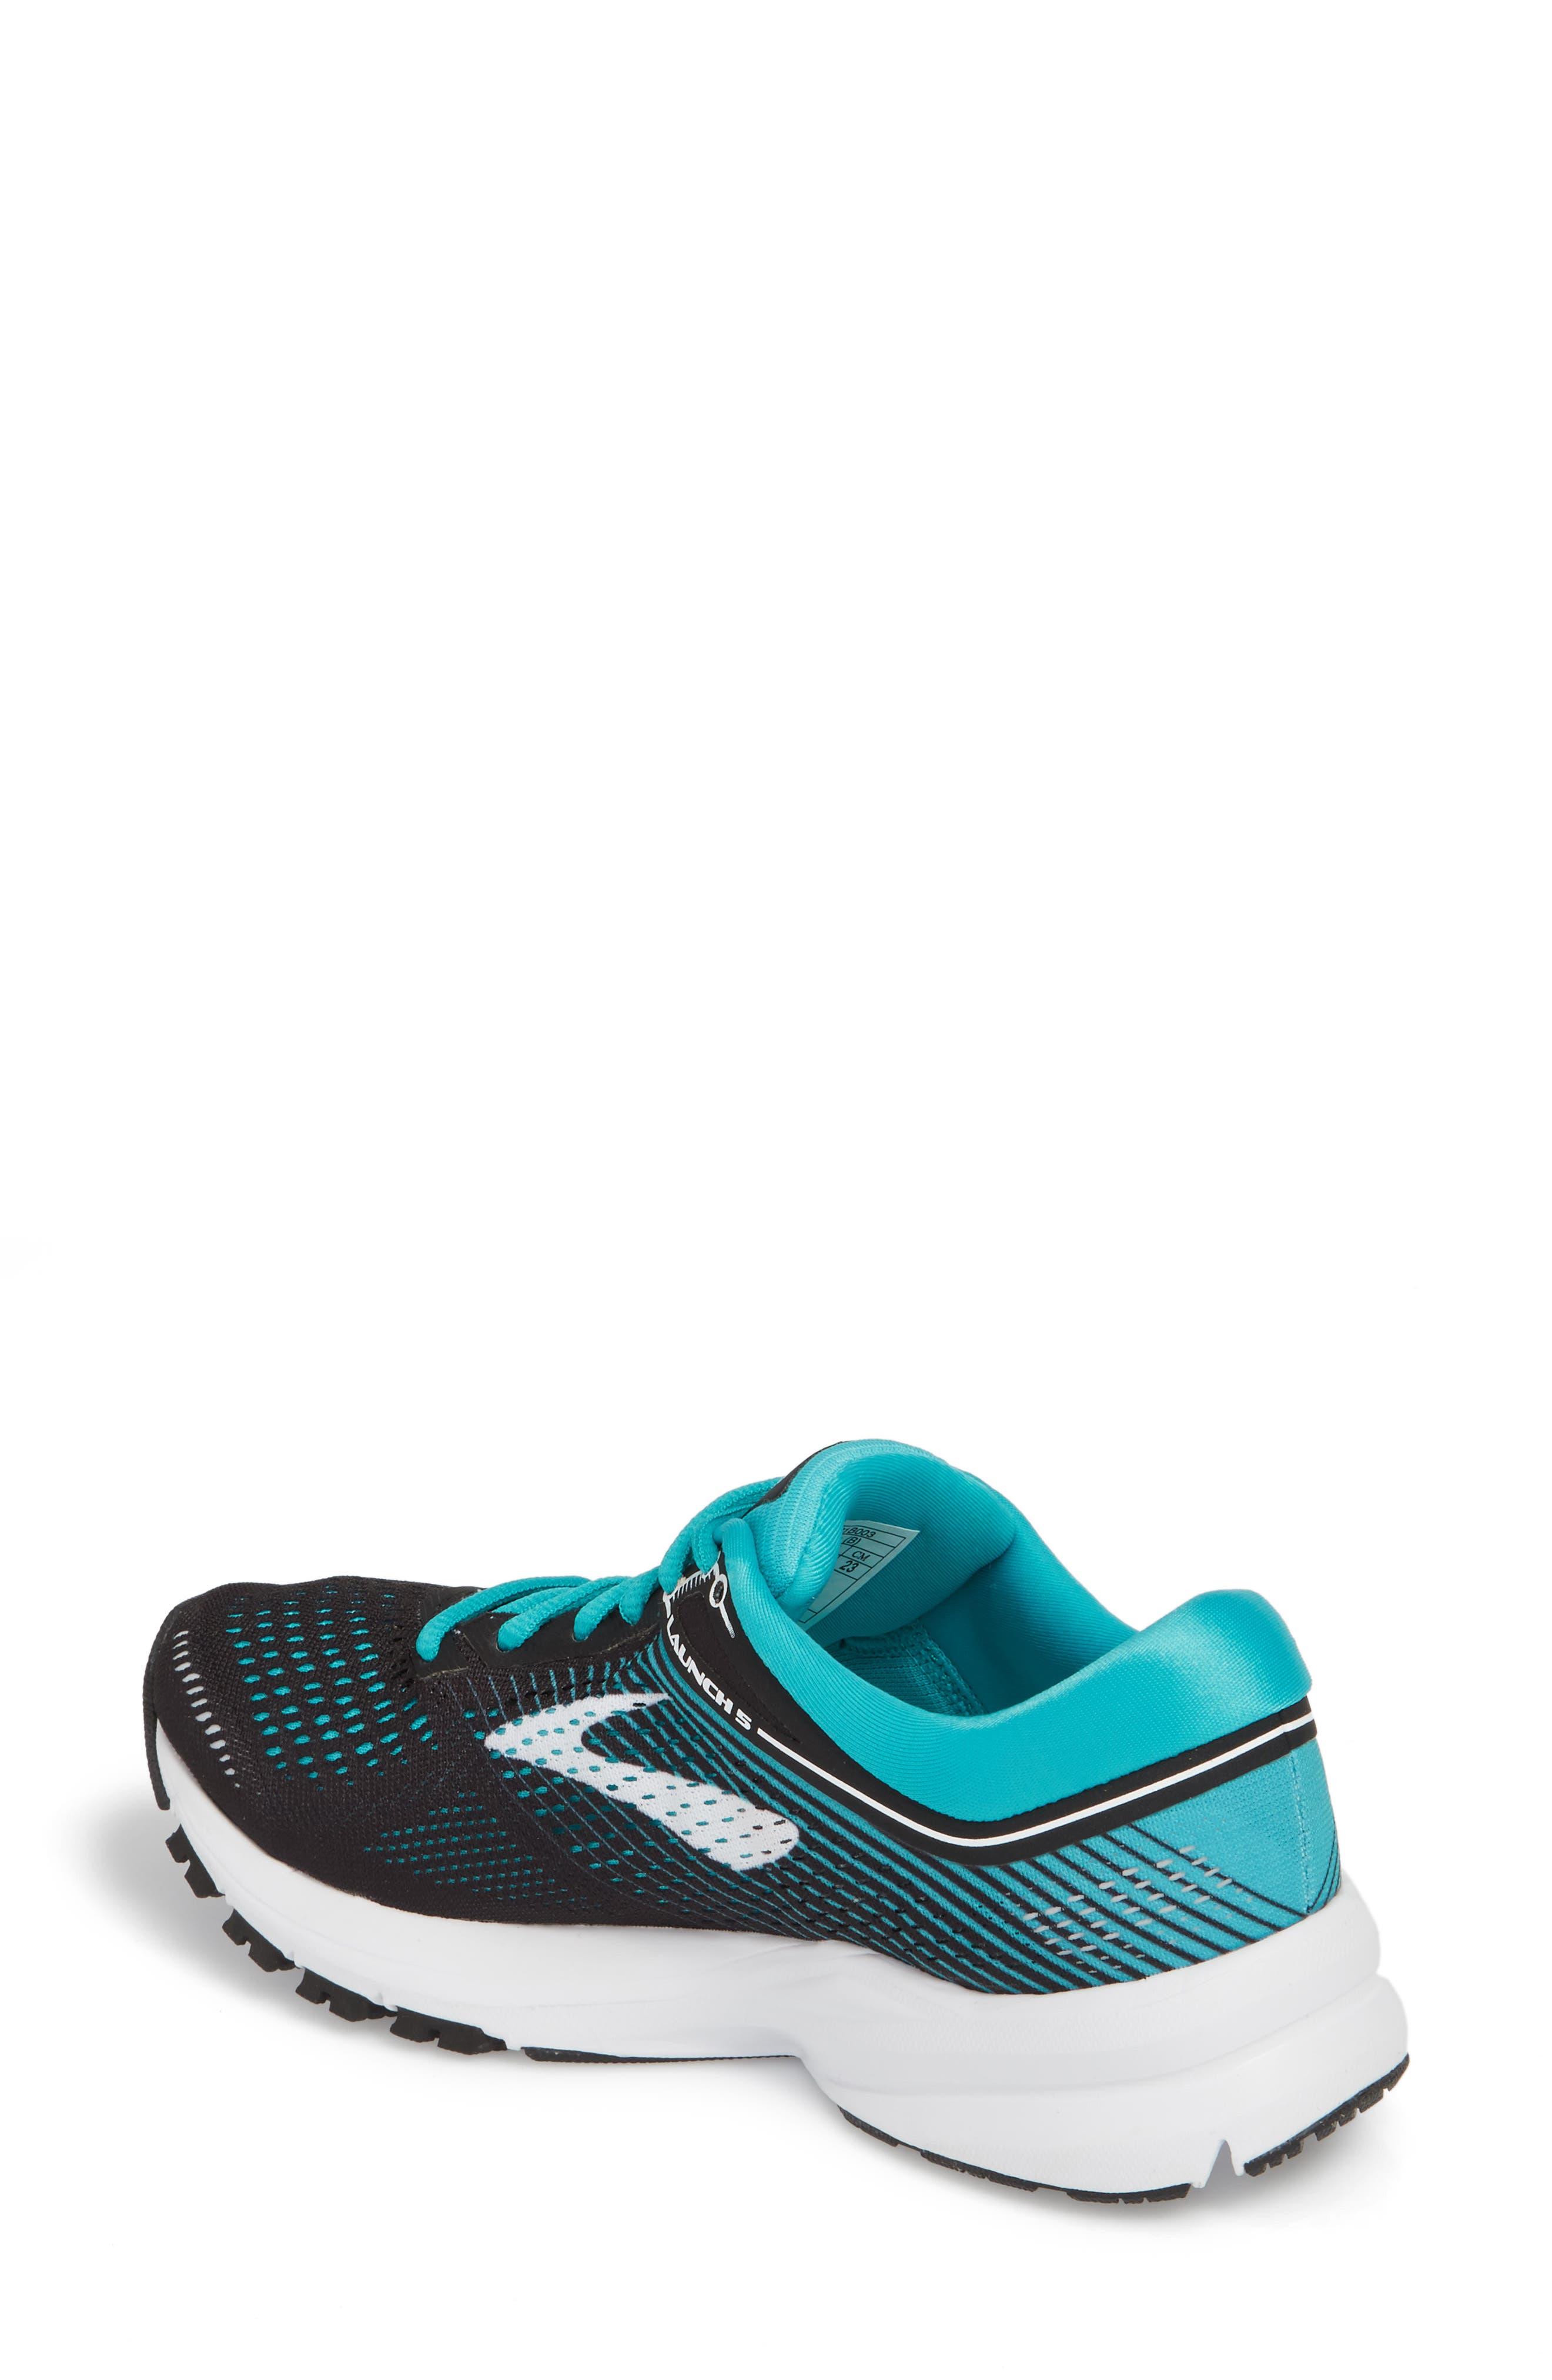 BROOKS,                             Launch 5 Running Shoe,                             Alternate thumbnail 2, color,                             BLACK/ TEAL GREEN/ WHITE